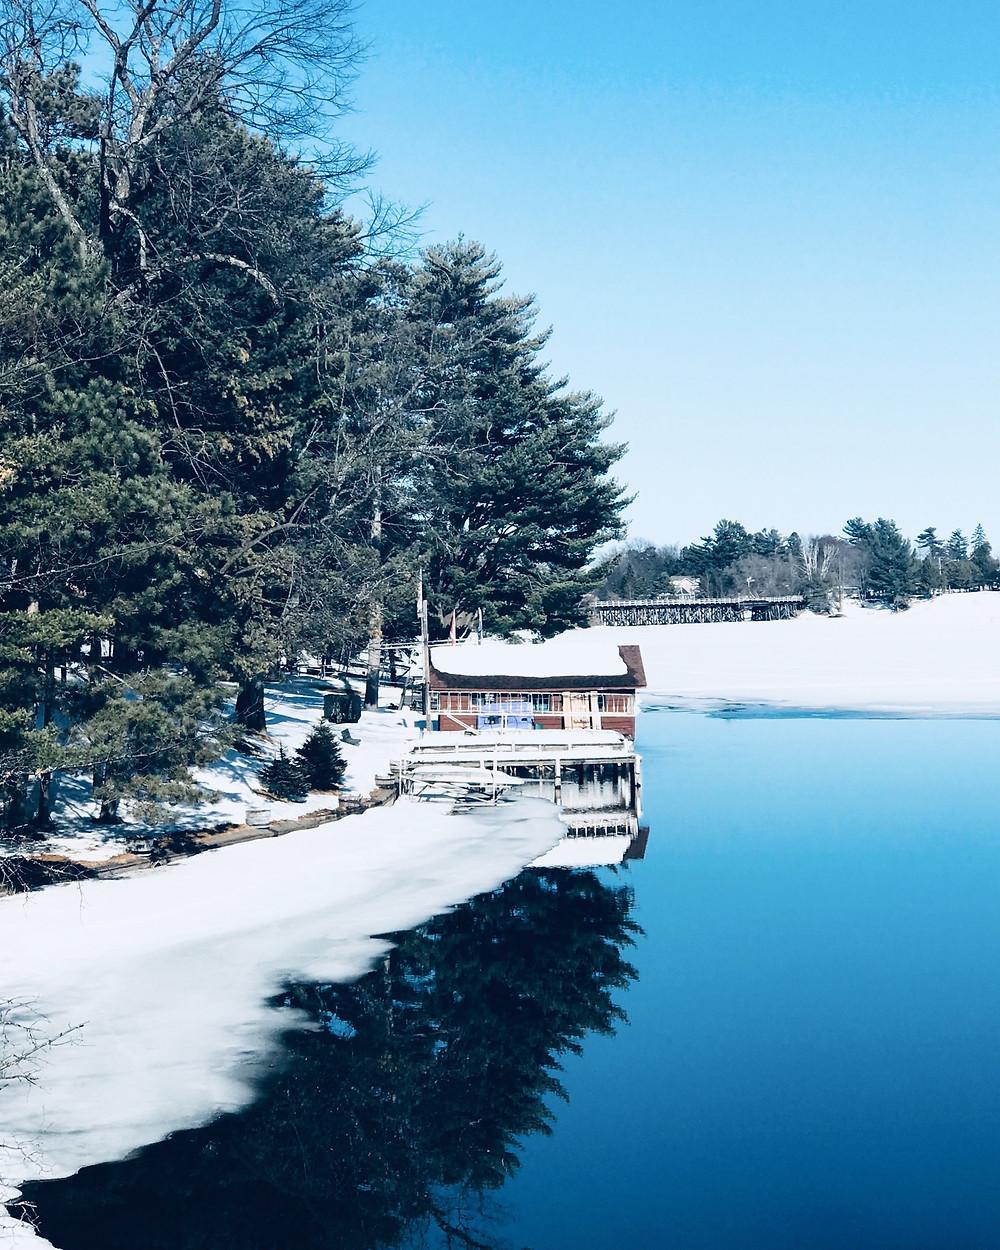 Nitschke's Northern Resort in Winter